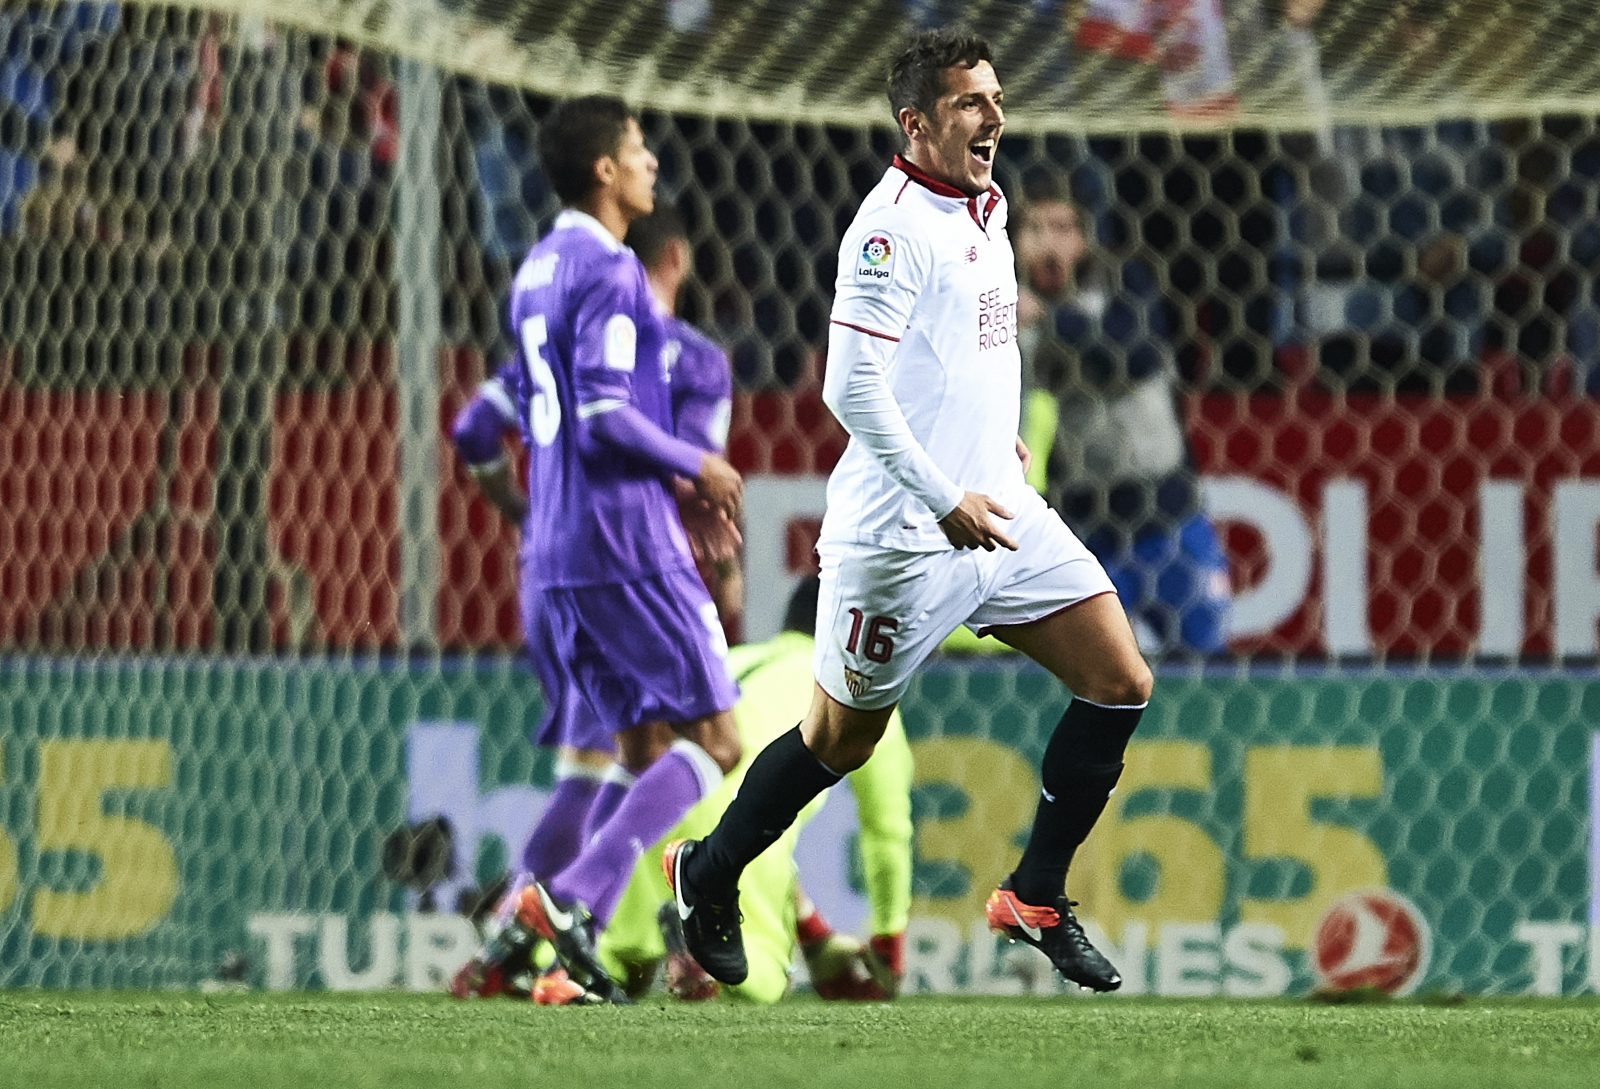 Match Reports: Sevilla FC 2-1 Real Madrid